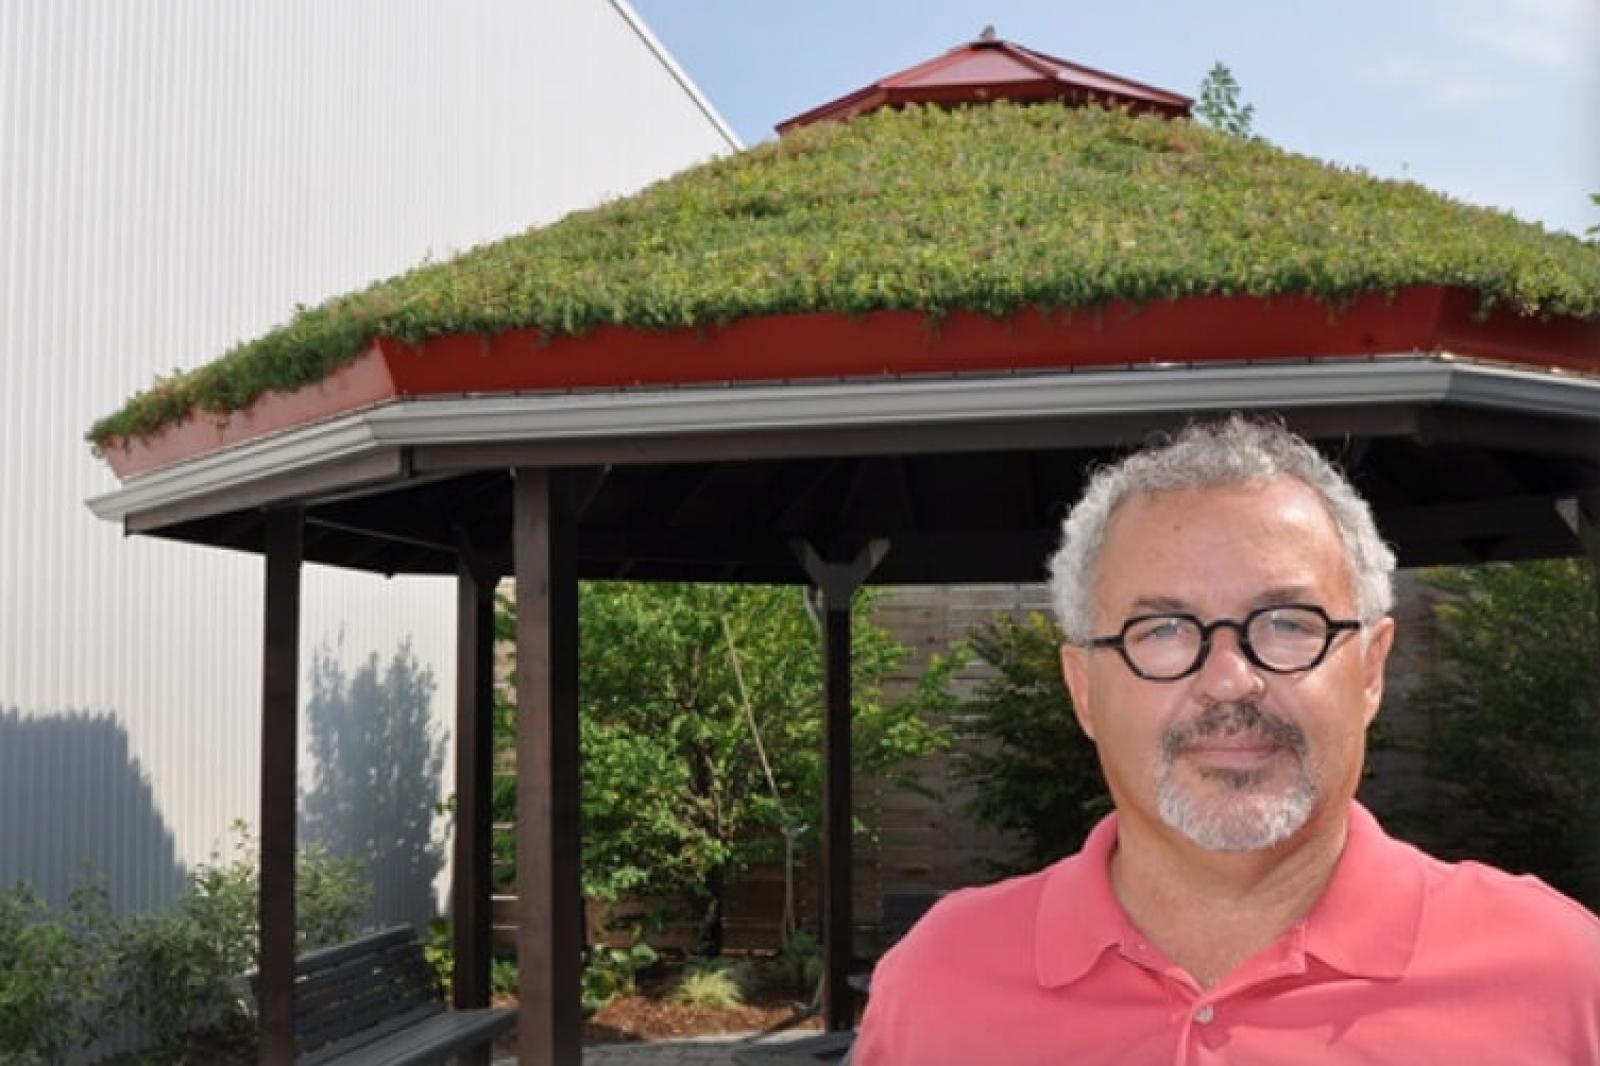 Plantsman Terry McGlade reflects on 30 years of change